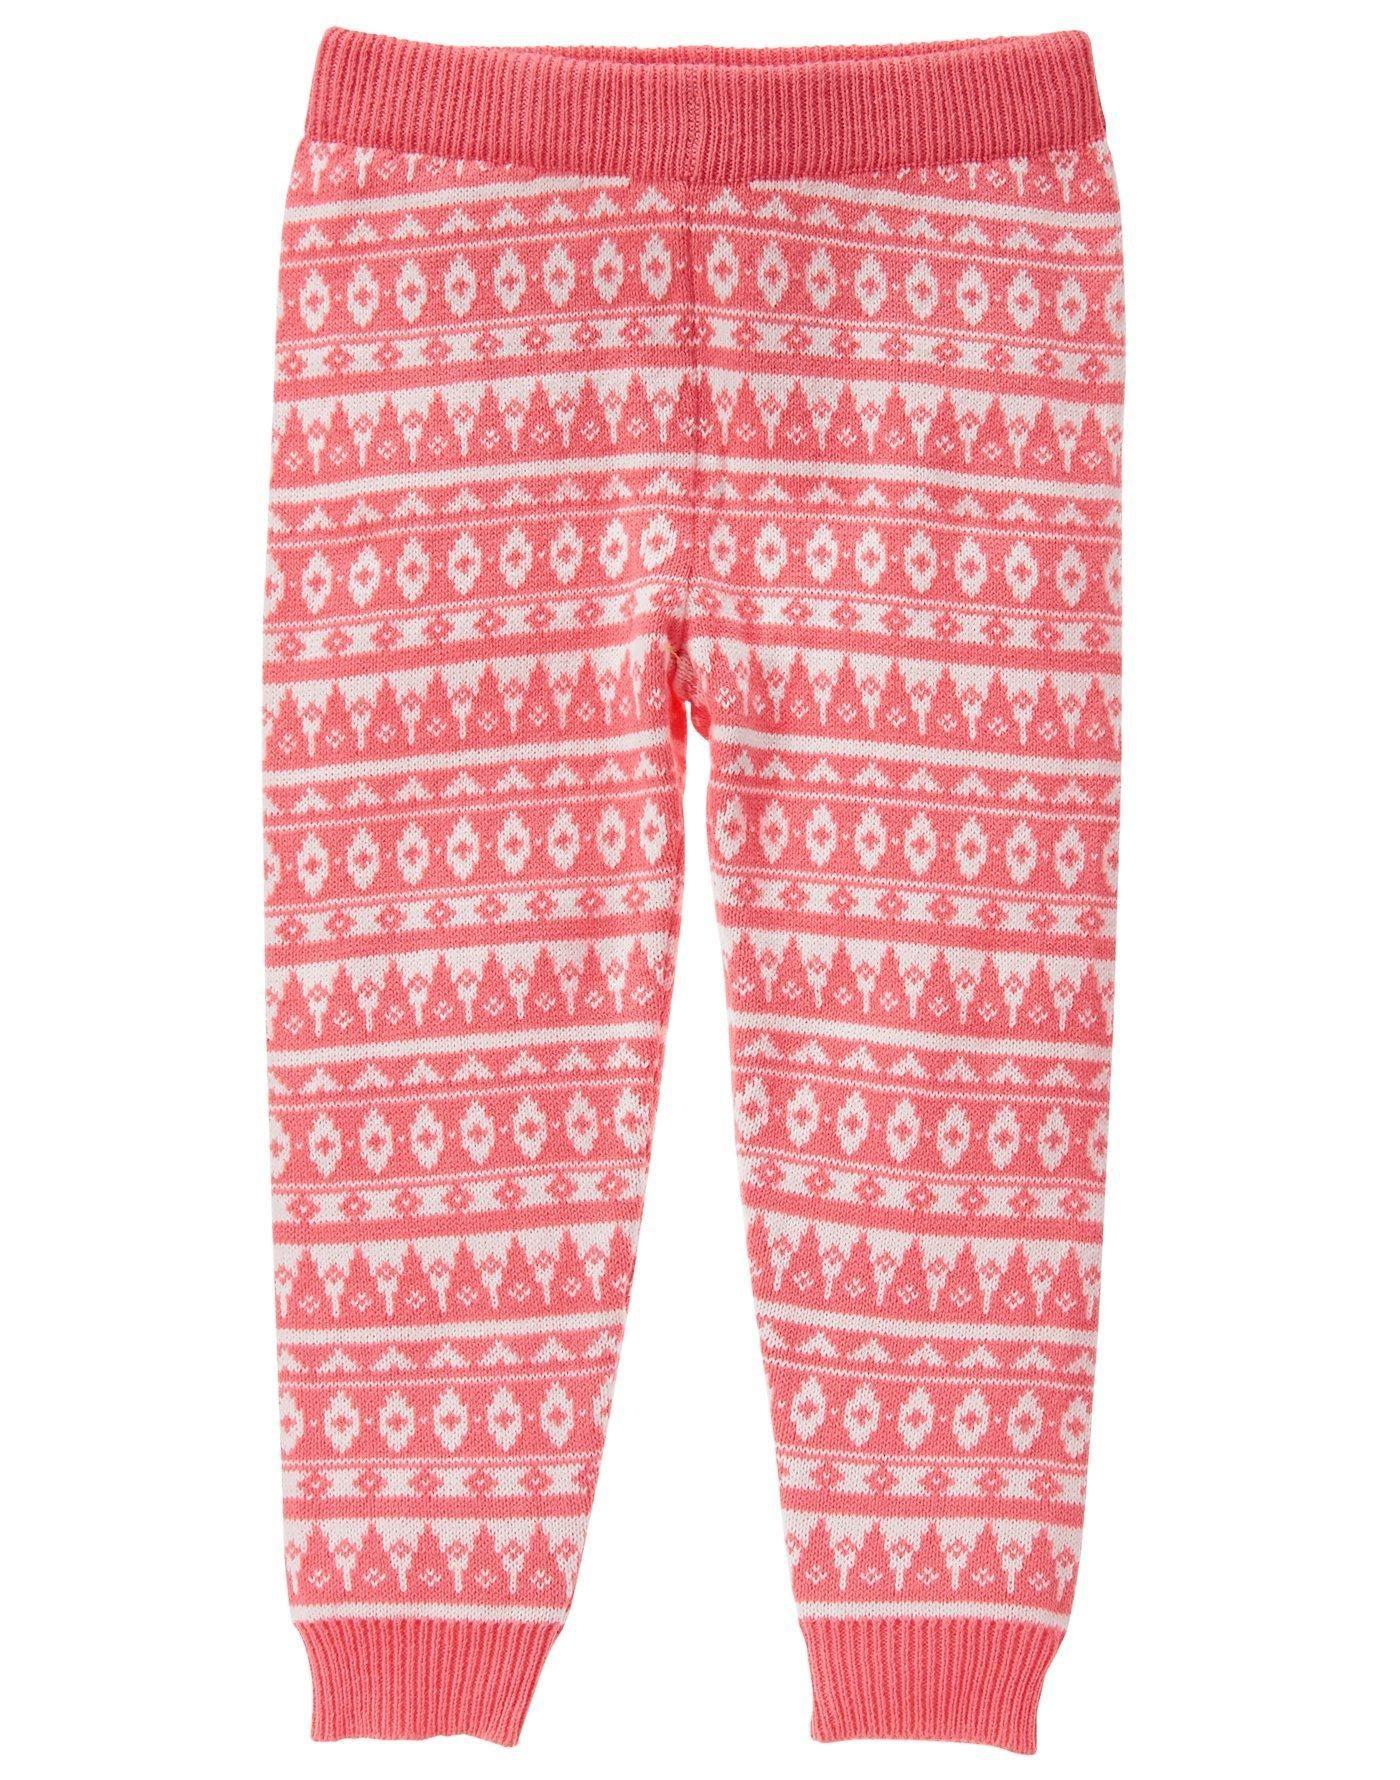 Fair Isle Sweater Leggings | Toddler girls